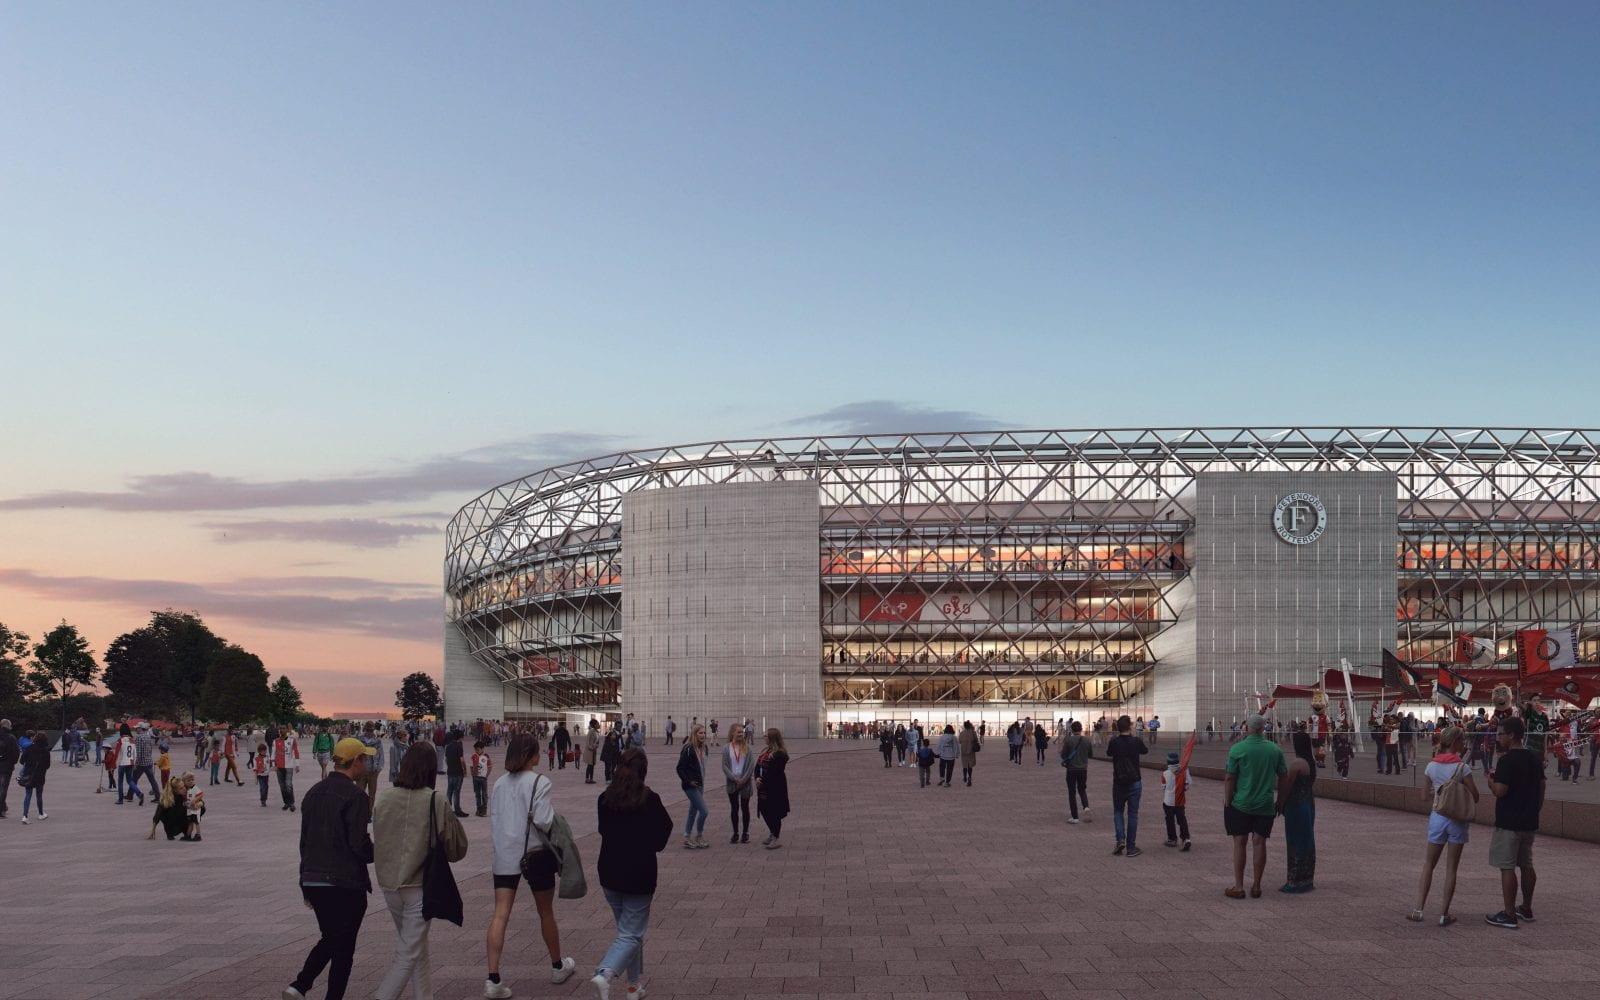 Das neue Fußball-Stadion für Feyenoord Rotterdam (© Image courtesy of OMA and Beauty & The Bit)